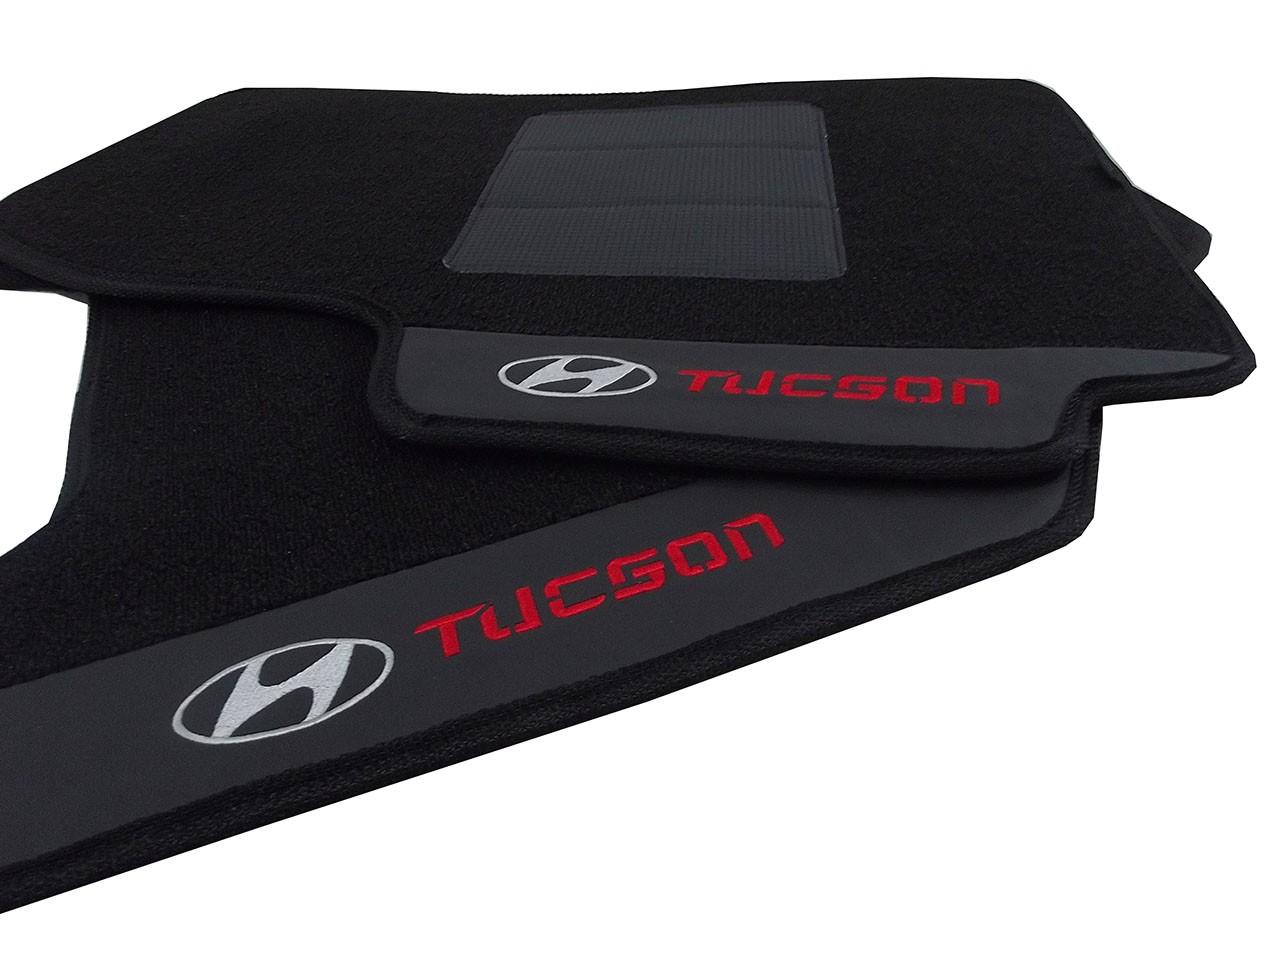 Tapete Hyundai Veloster Carpete Luxo Base Pinada